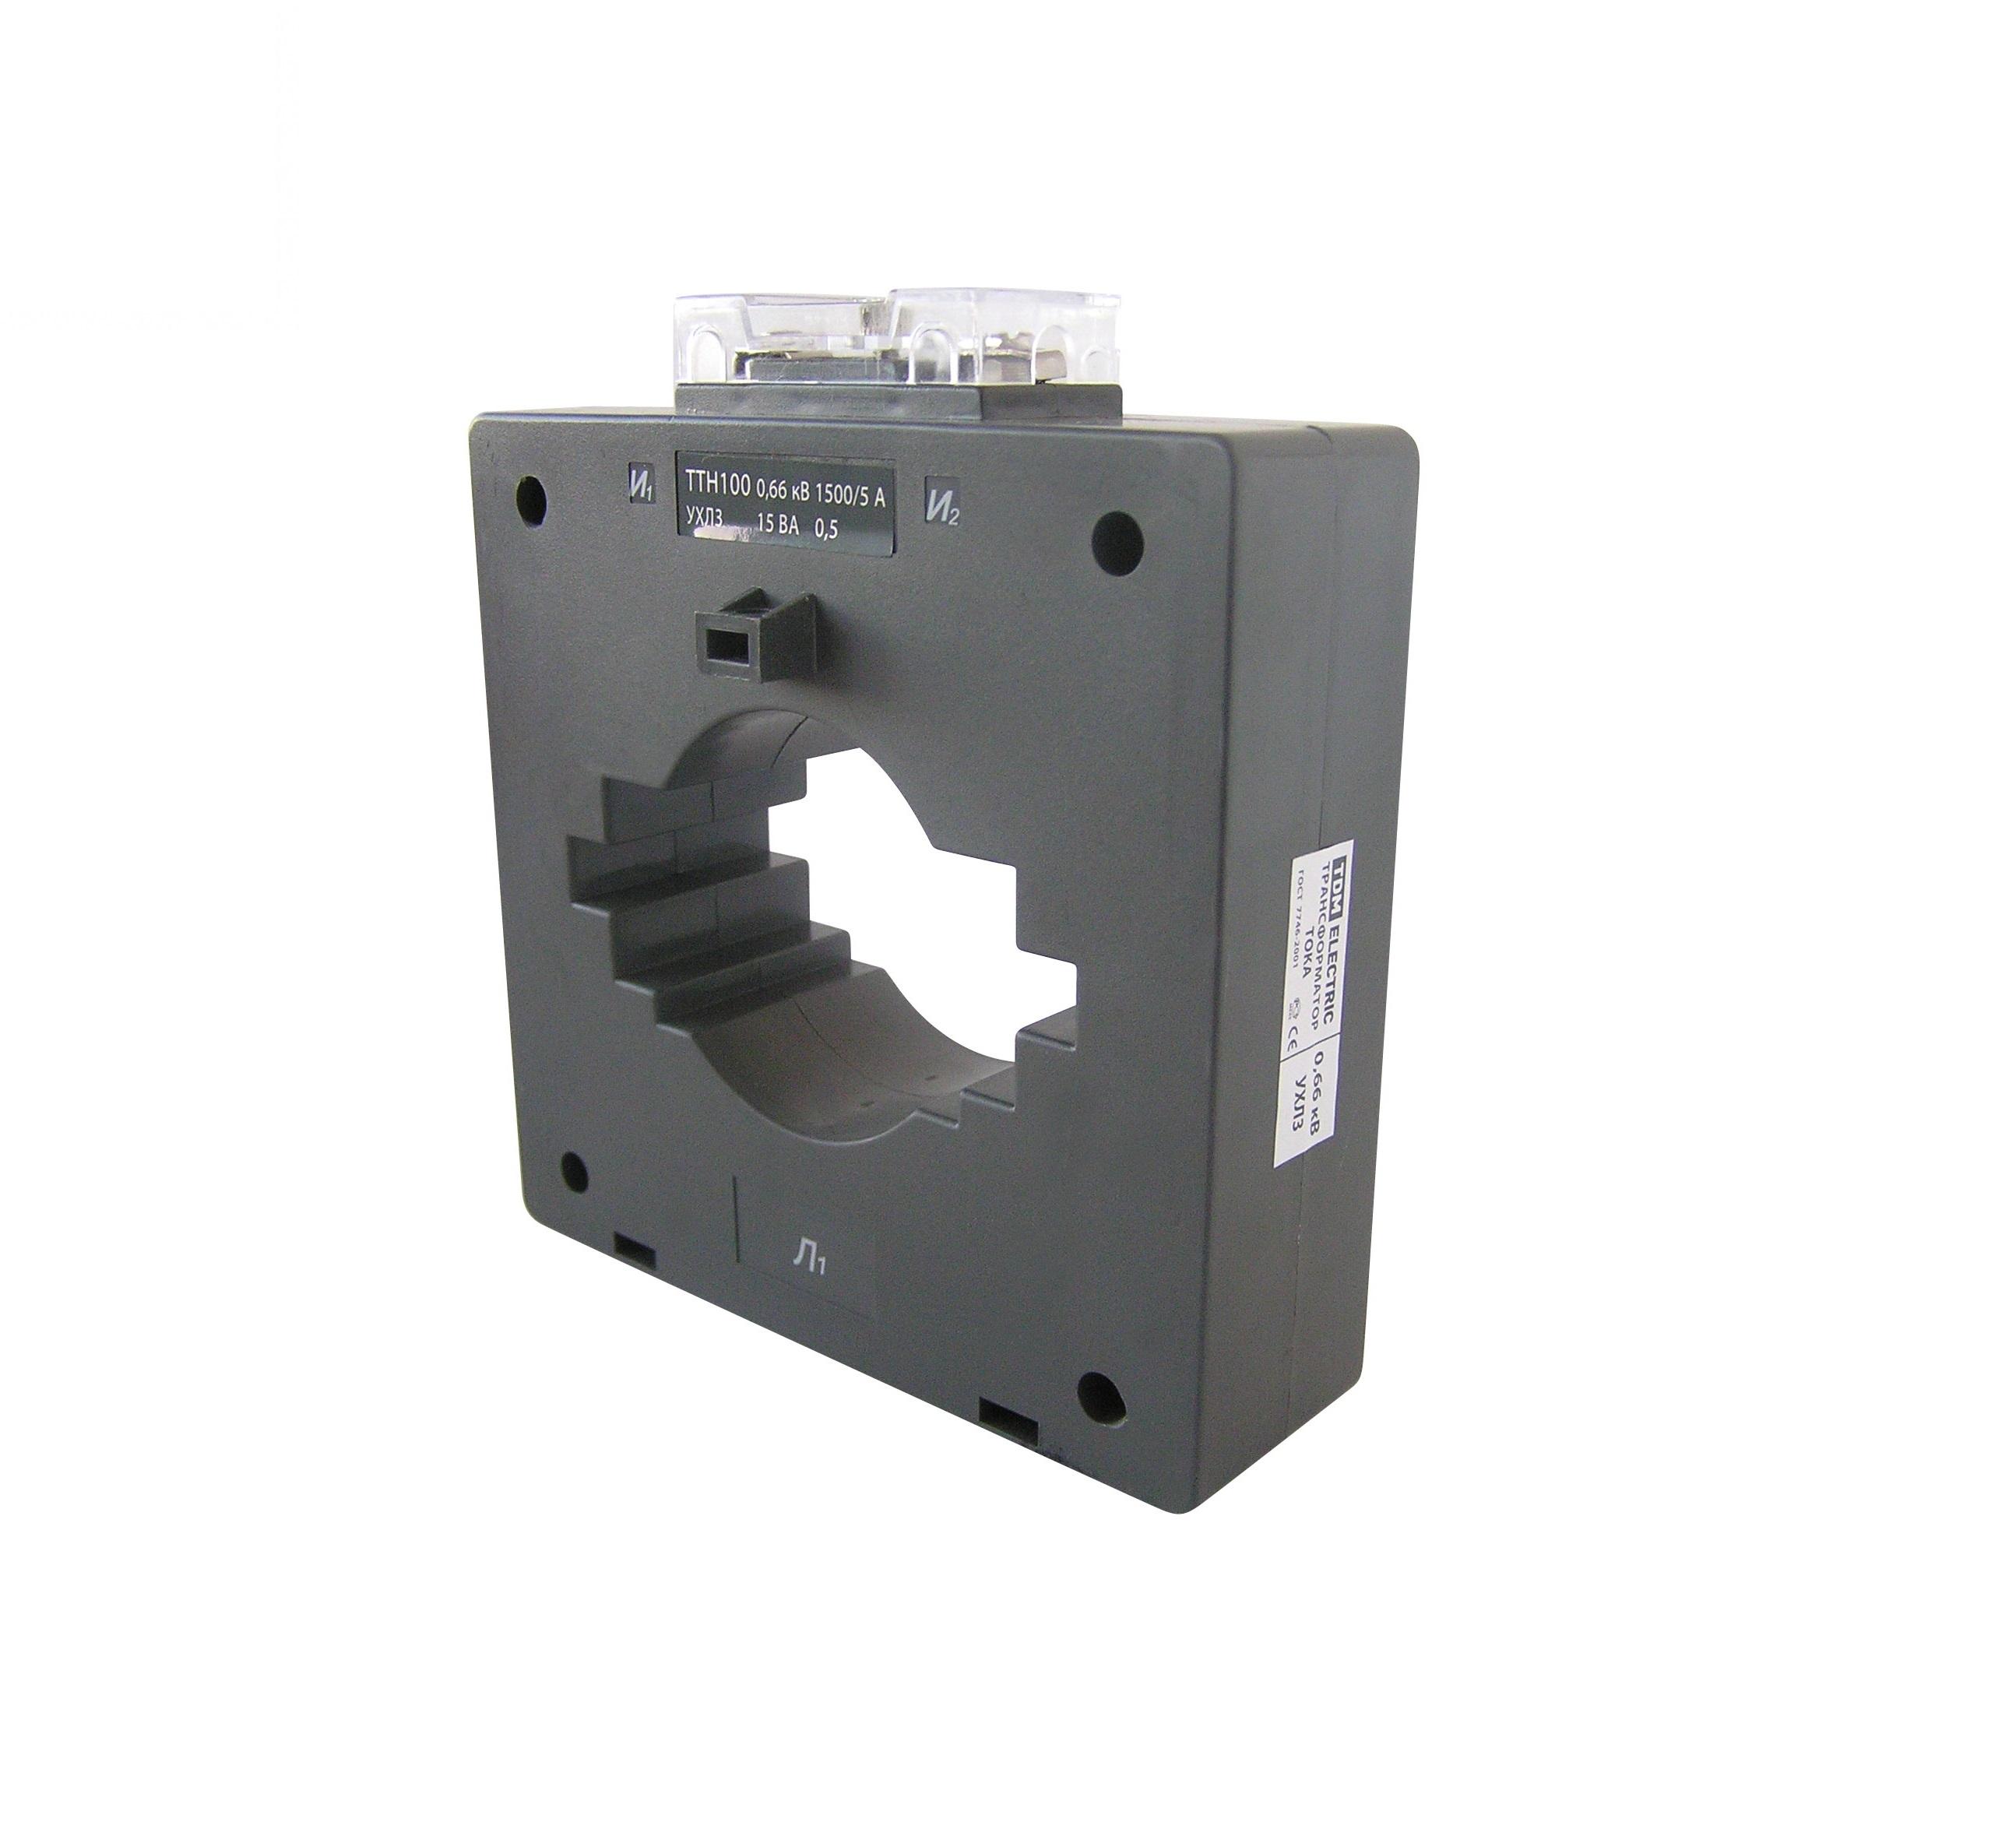 Трансформатор Tdm Sq1101-0138 трансформатор tdm sq1101 0149